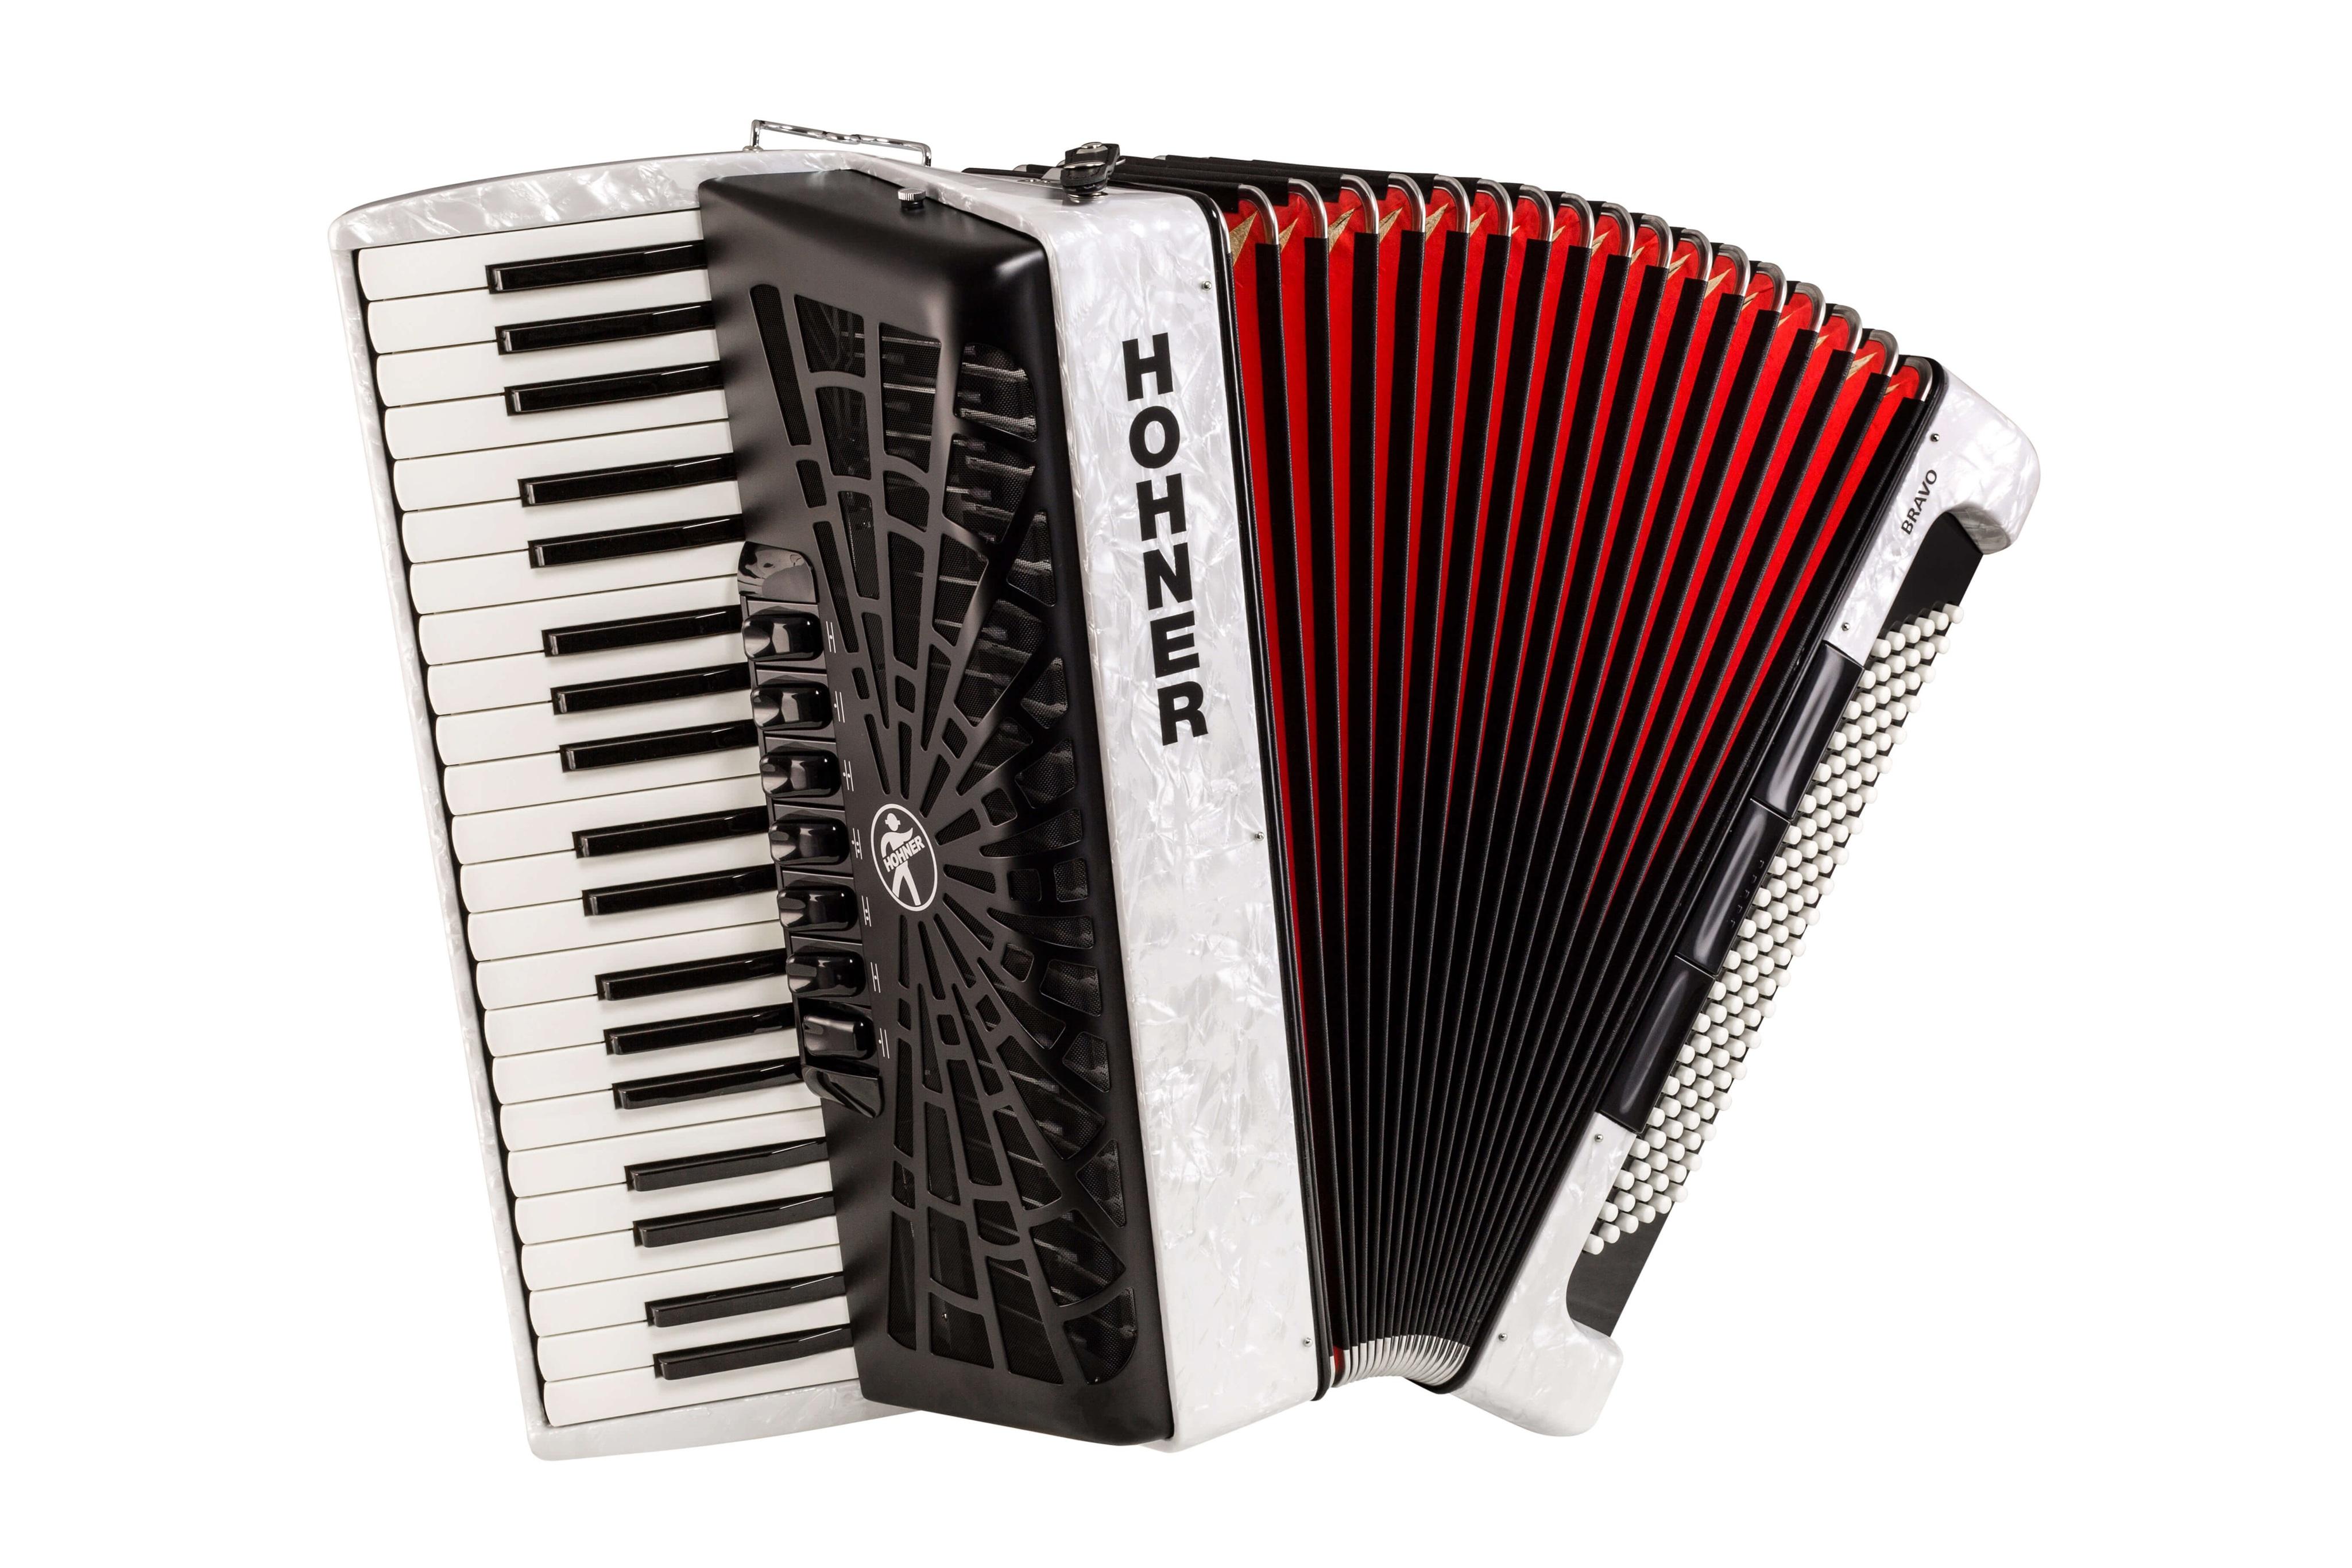 Hohner Bravo III 120 white (SilentKey)